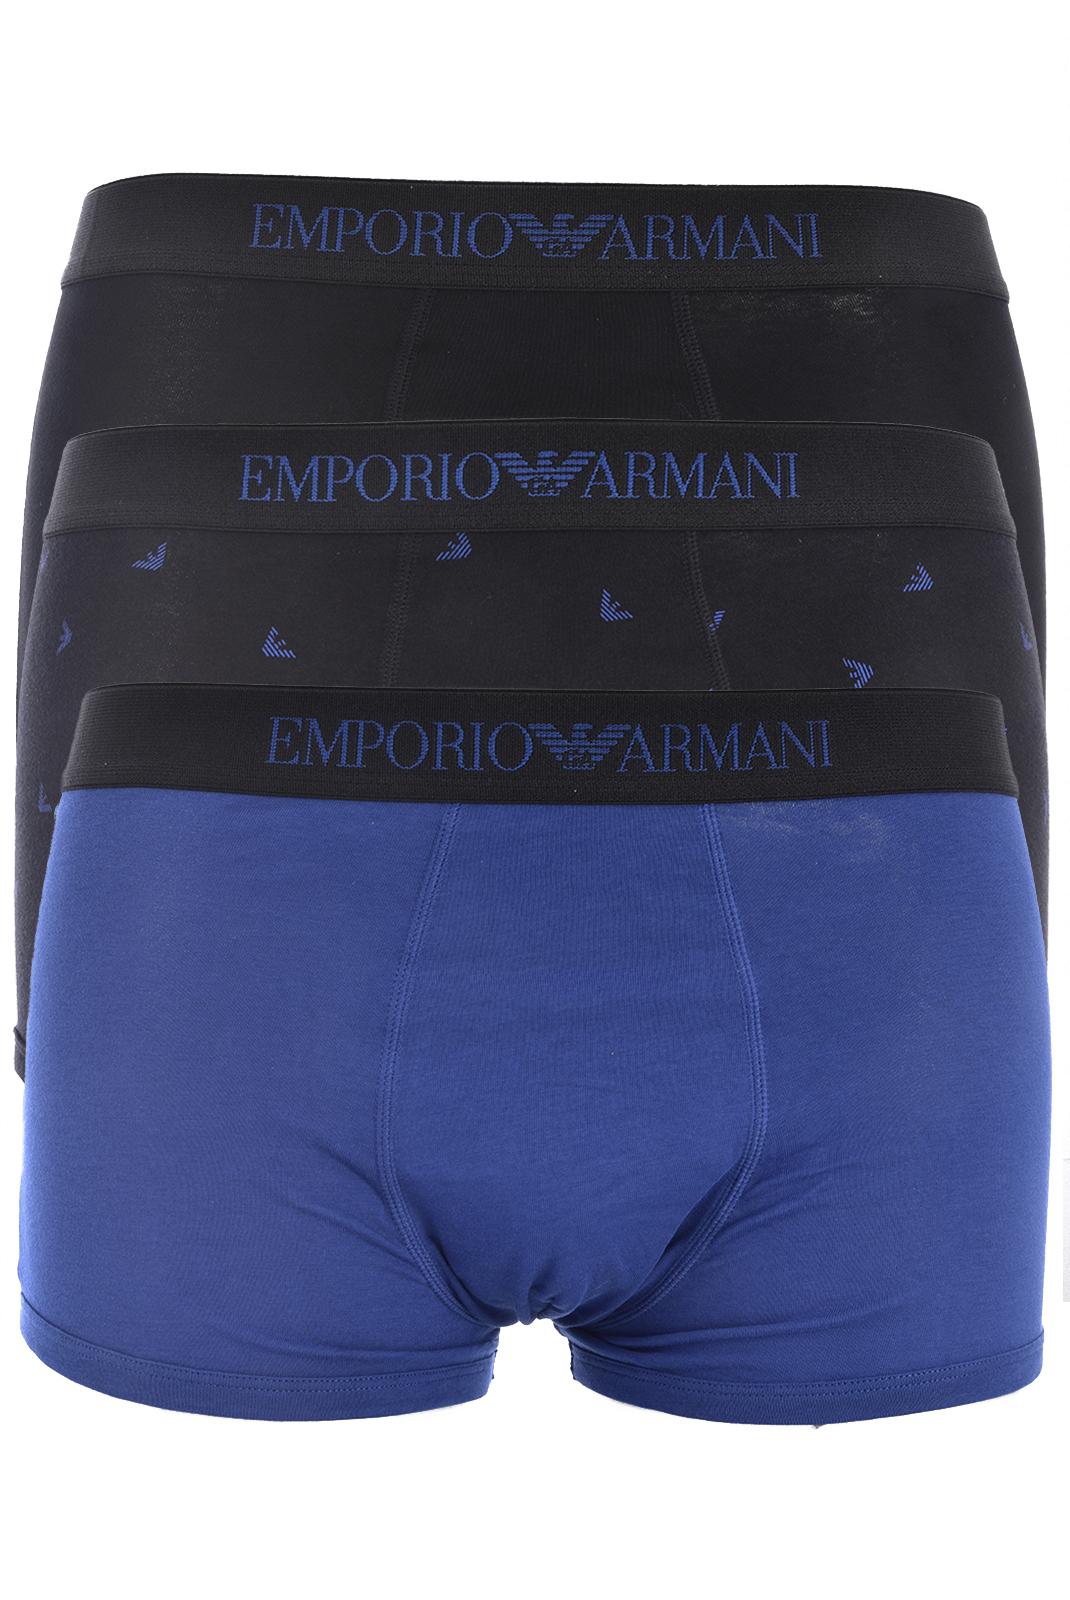 Slips-Caleçons  Emporio armani 111625 9A722 69920